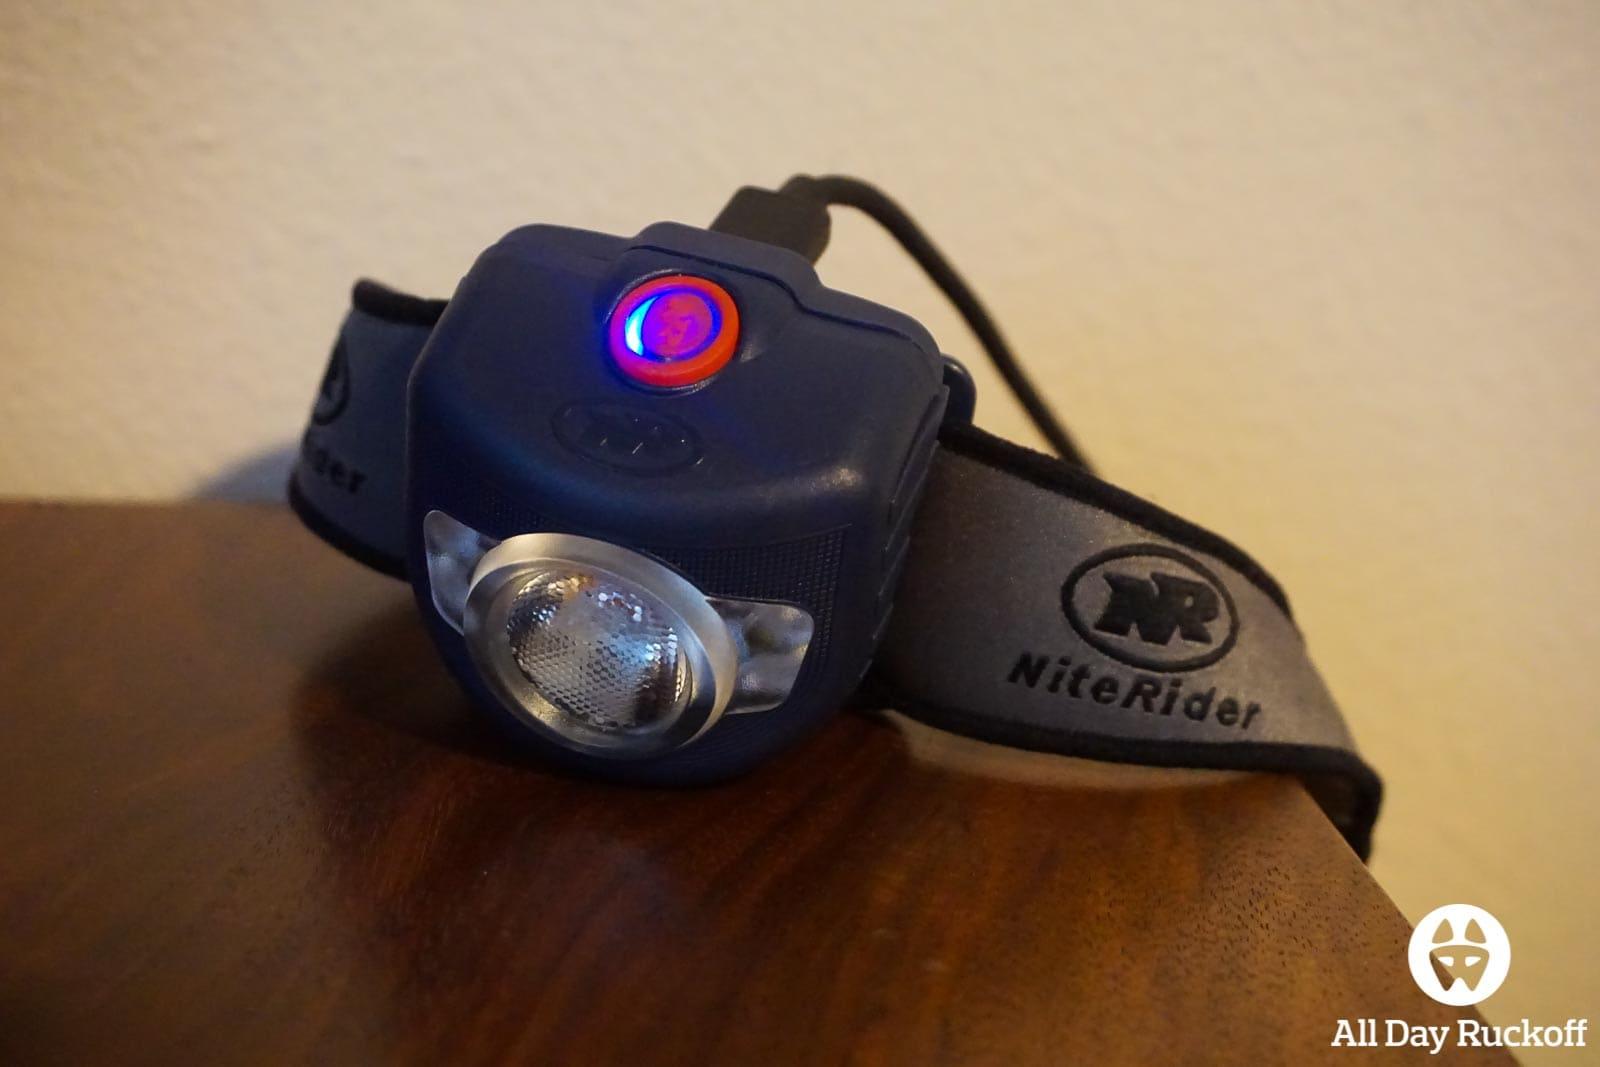 Nite Rider Adventure 180 - Charging